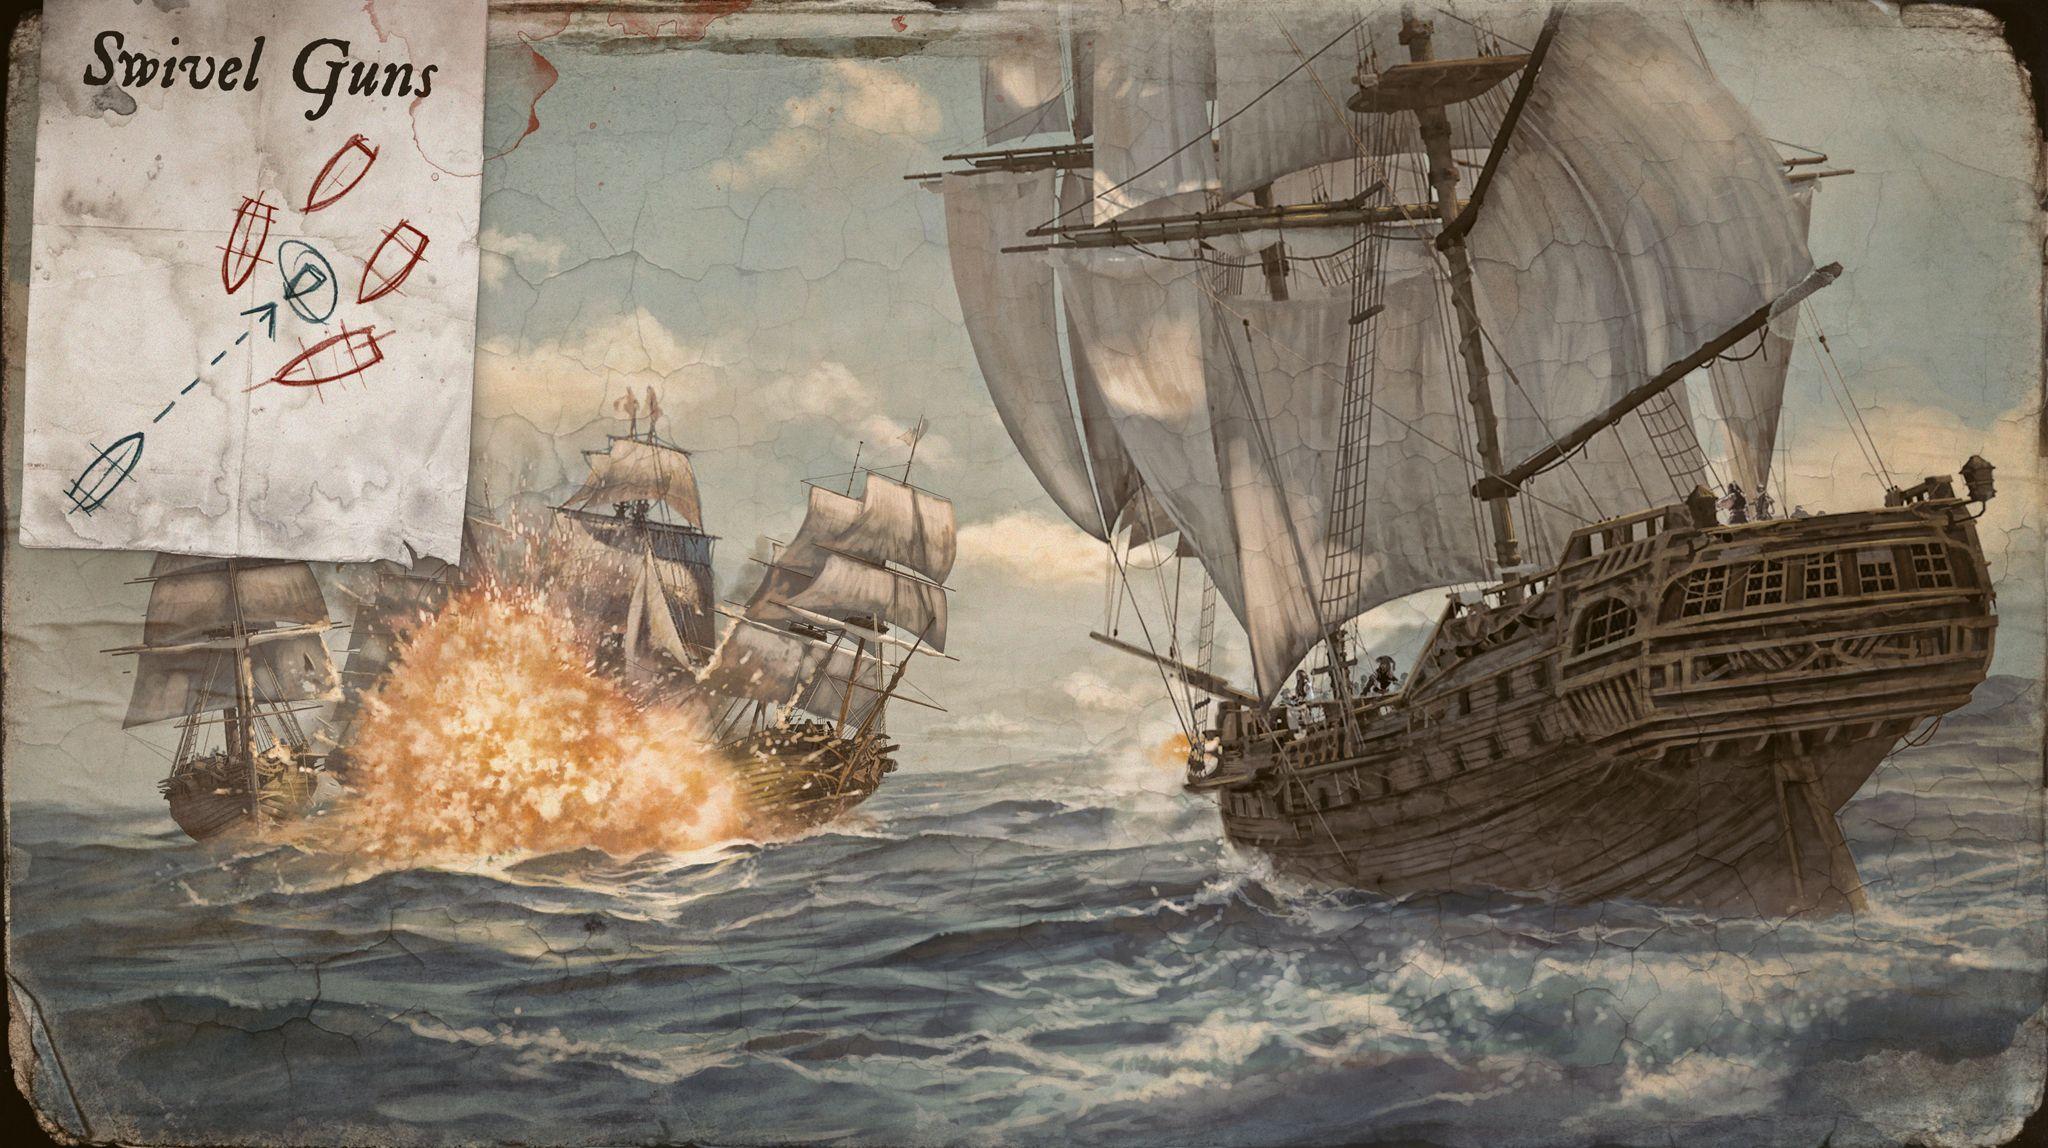 Assassin's Creed IV Black Flag Screenshots and Concept